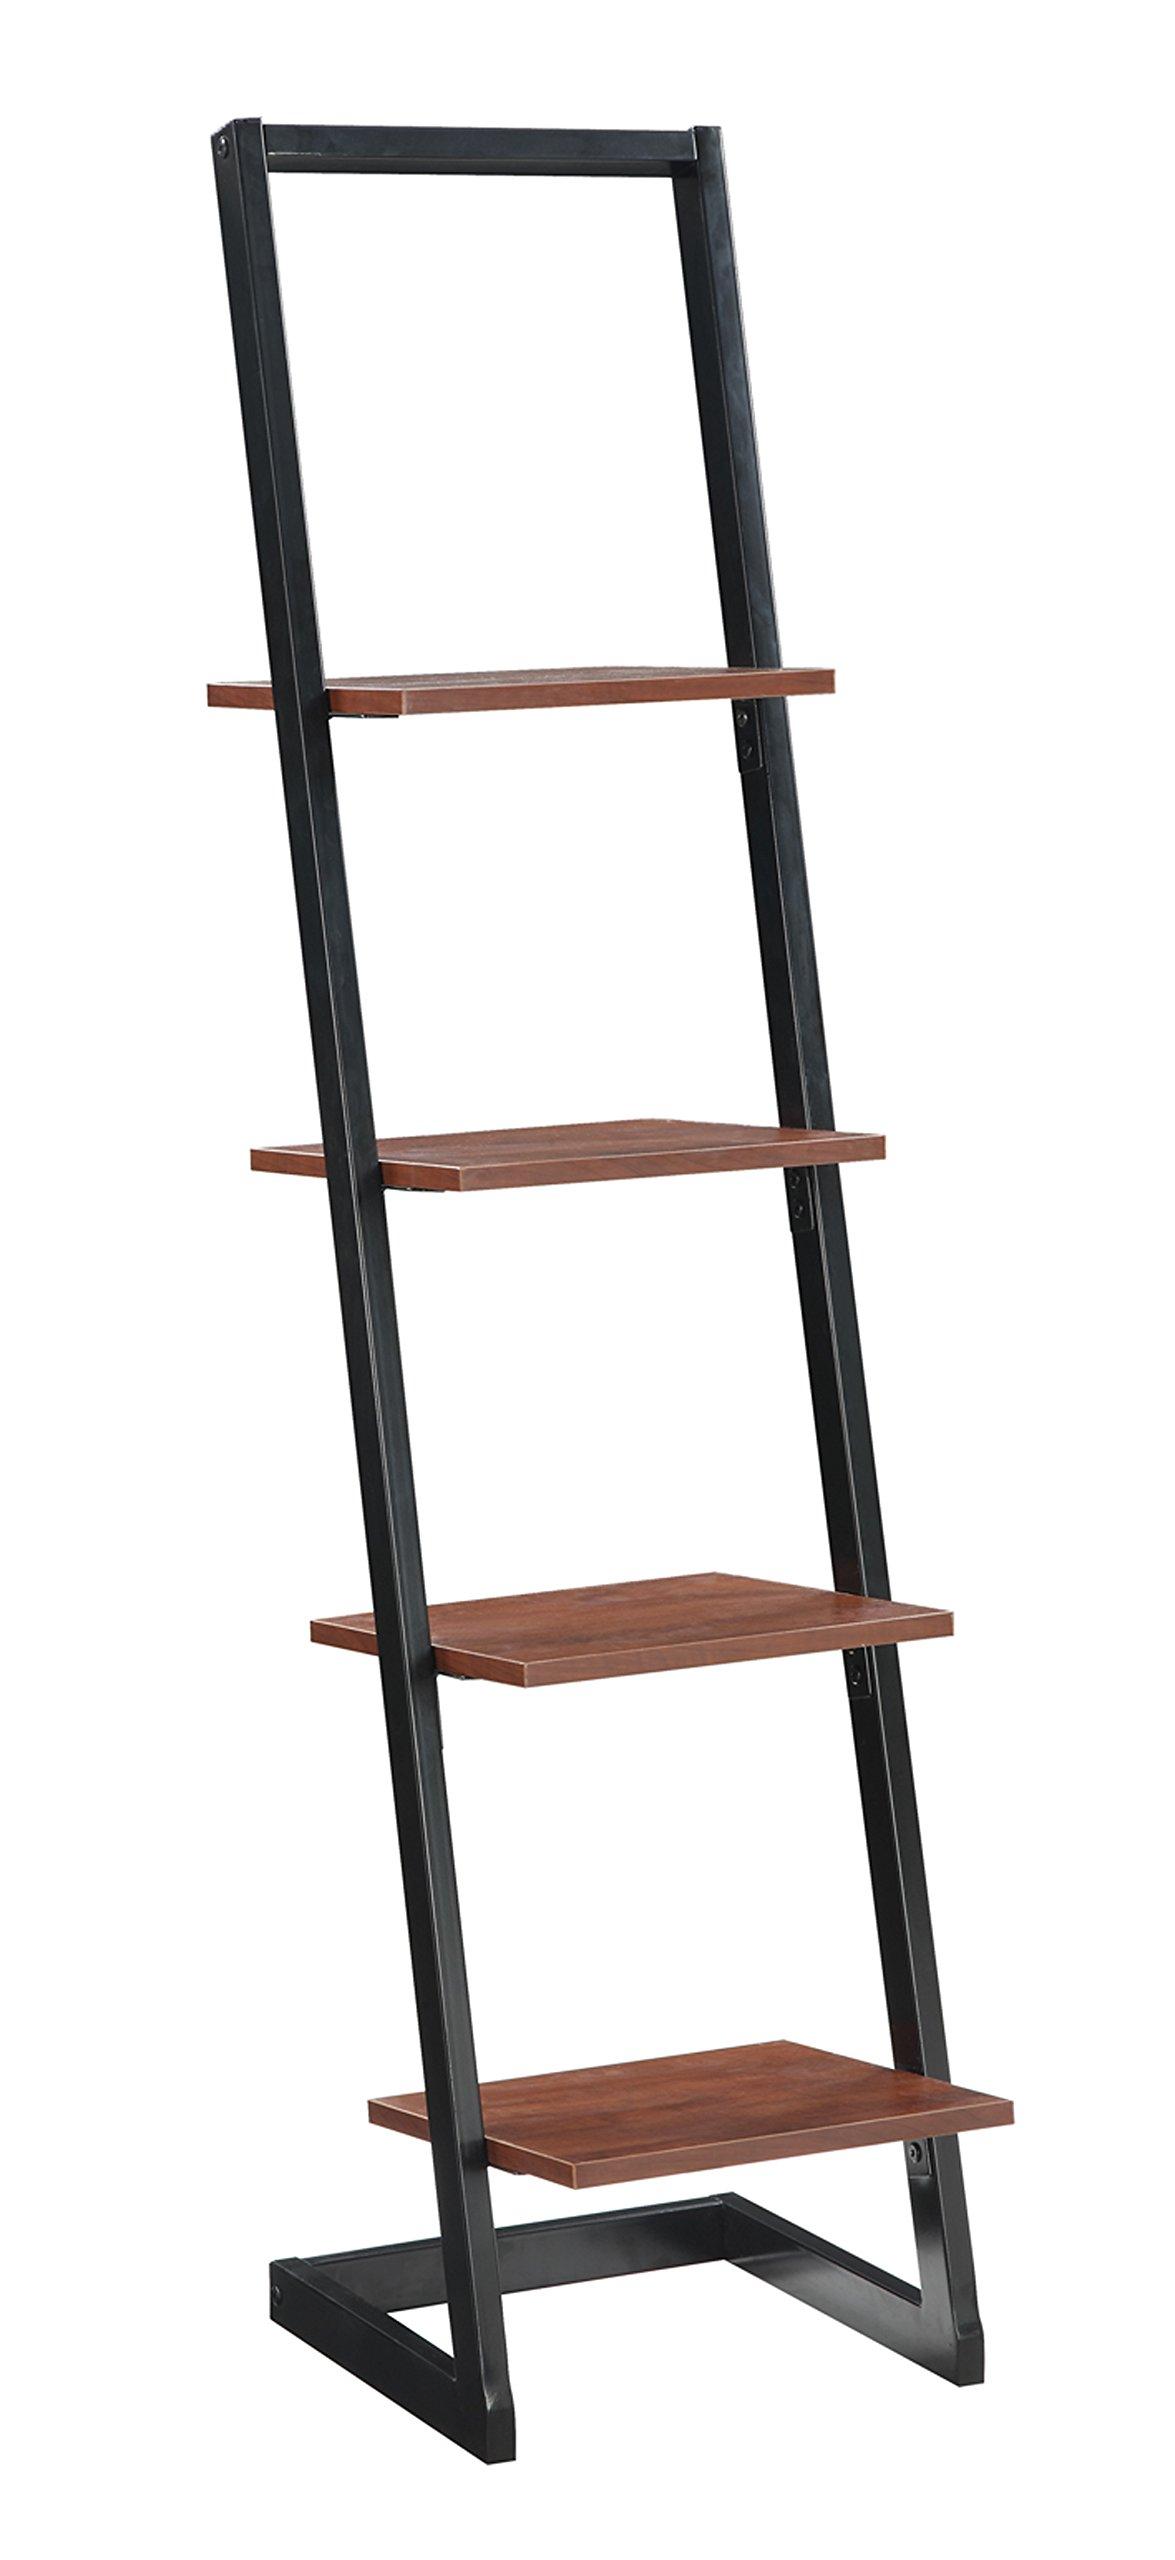 Convenience Concepts 4-Tier Ladder Bookshelf